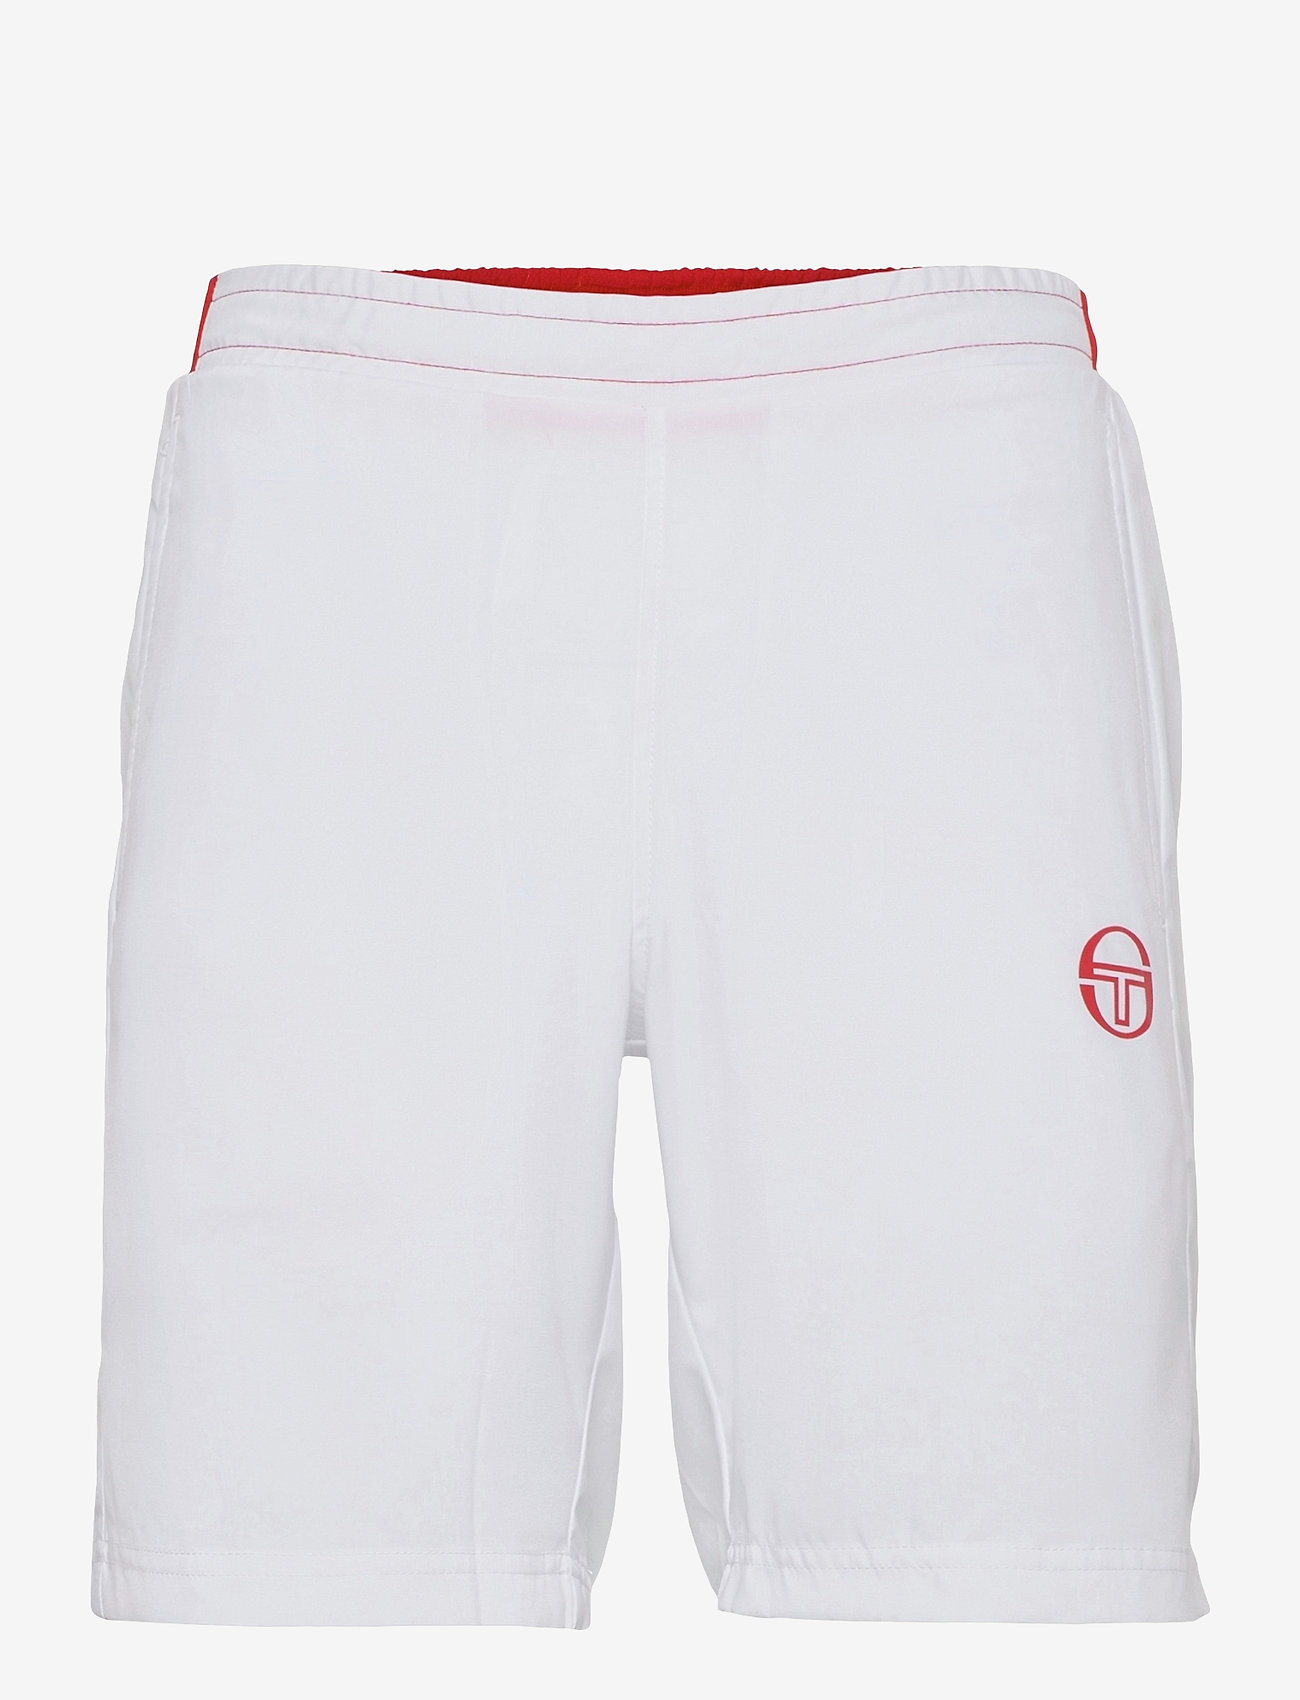 Sergio Tacchini - CLUB TECH SHORTS - træningsshorts - white/red - 0